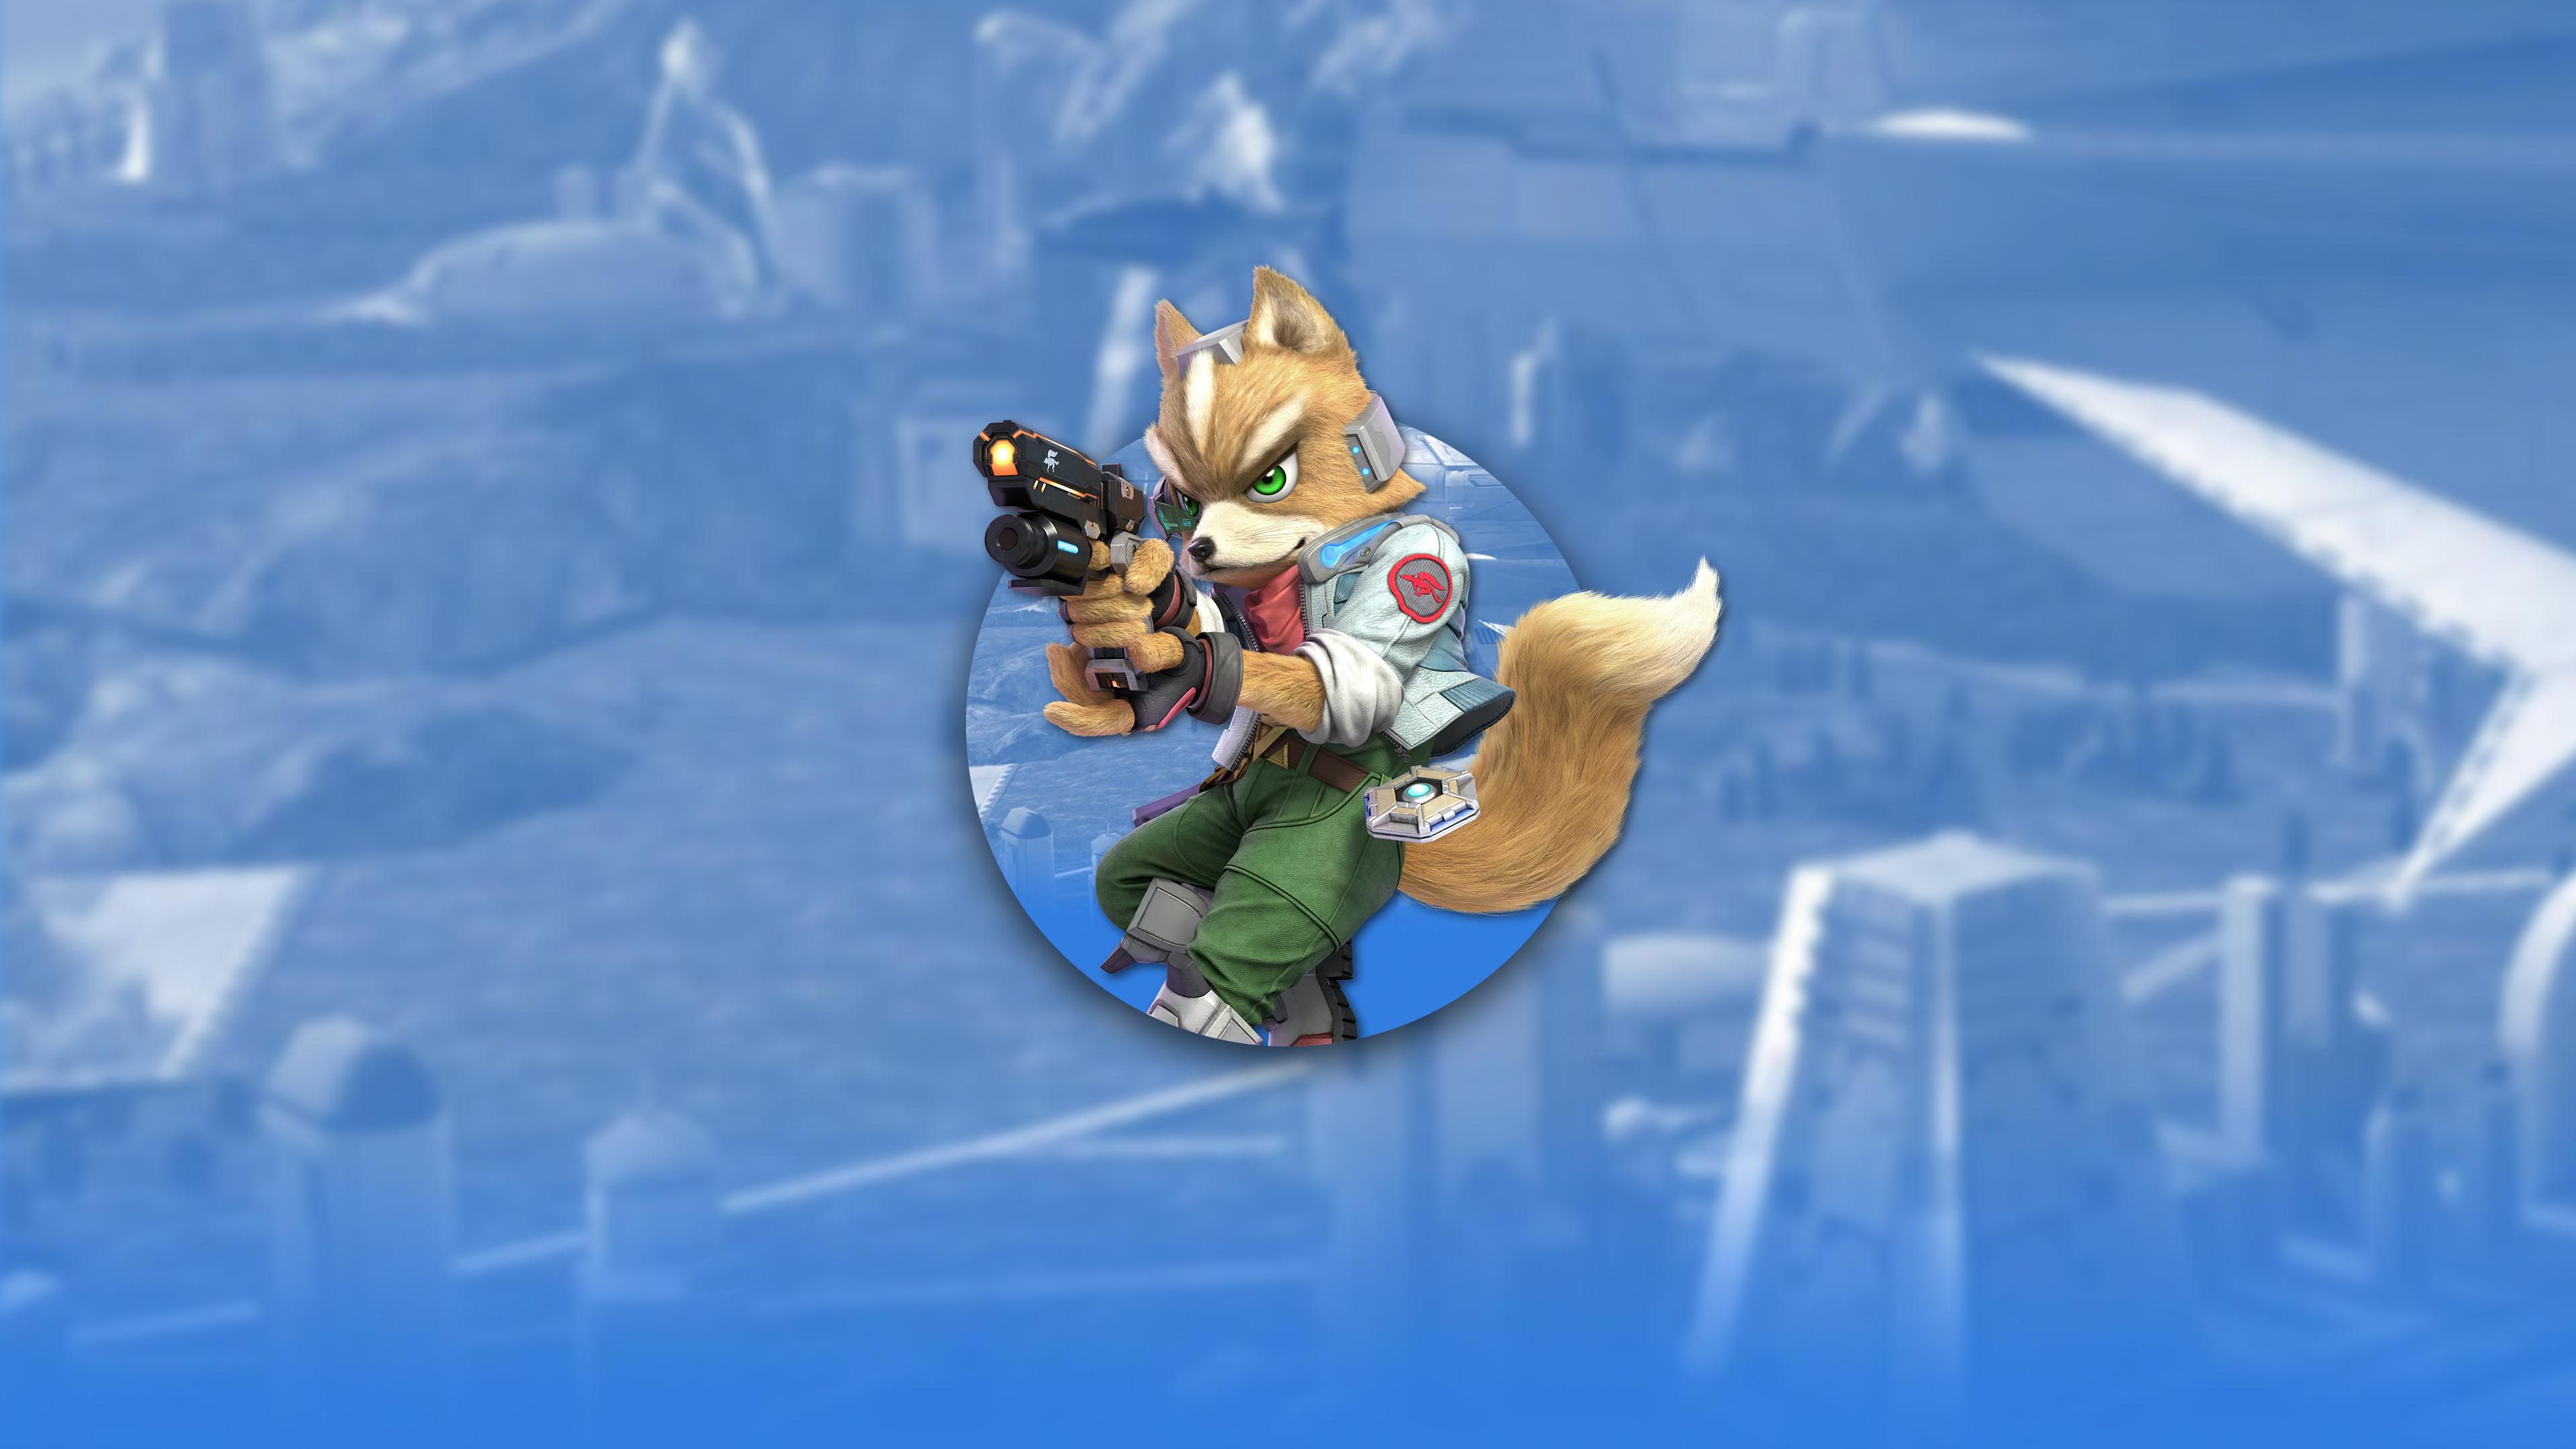 super smash bros ultimate fox uhd 4k wallpaper